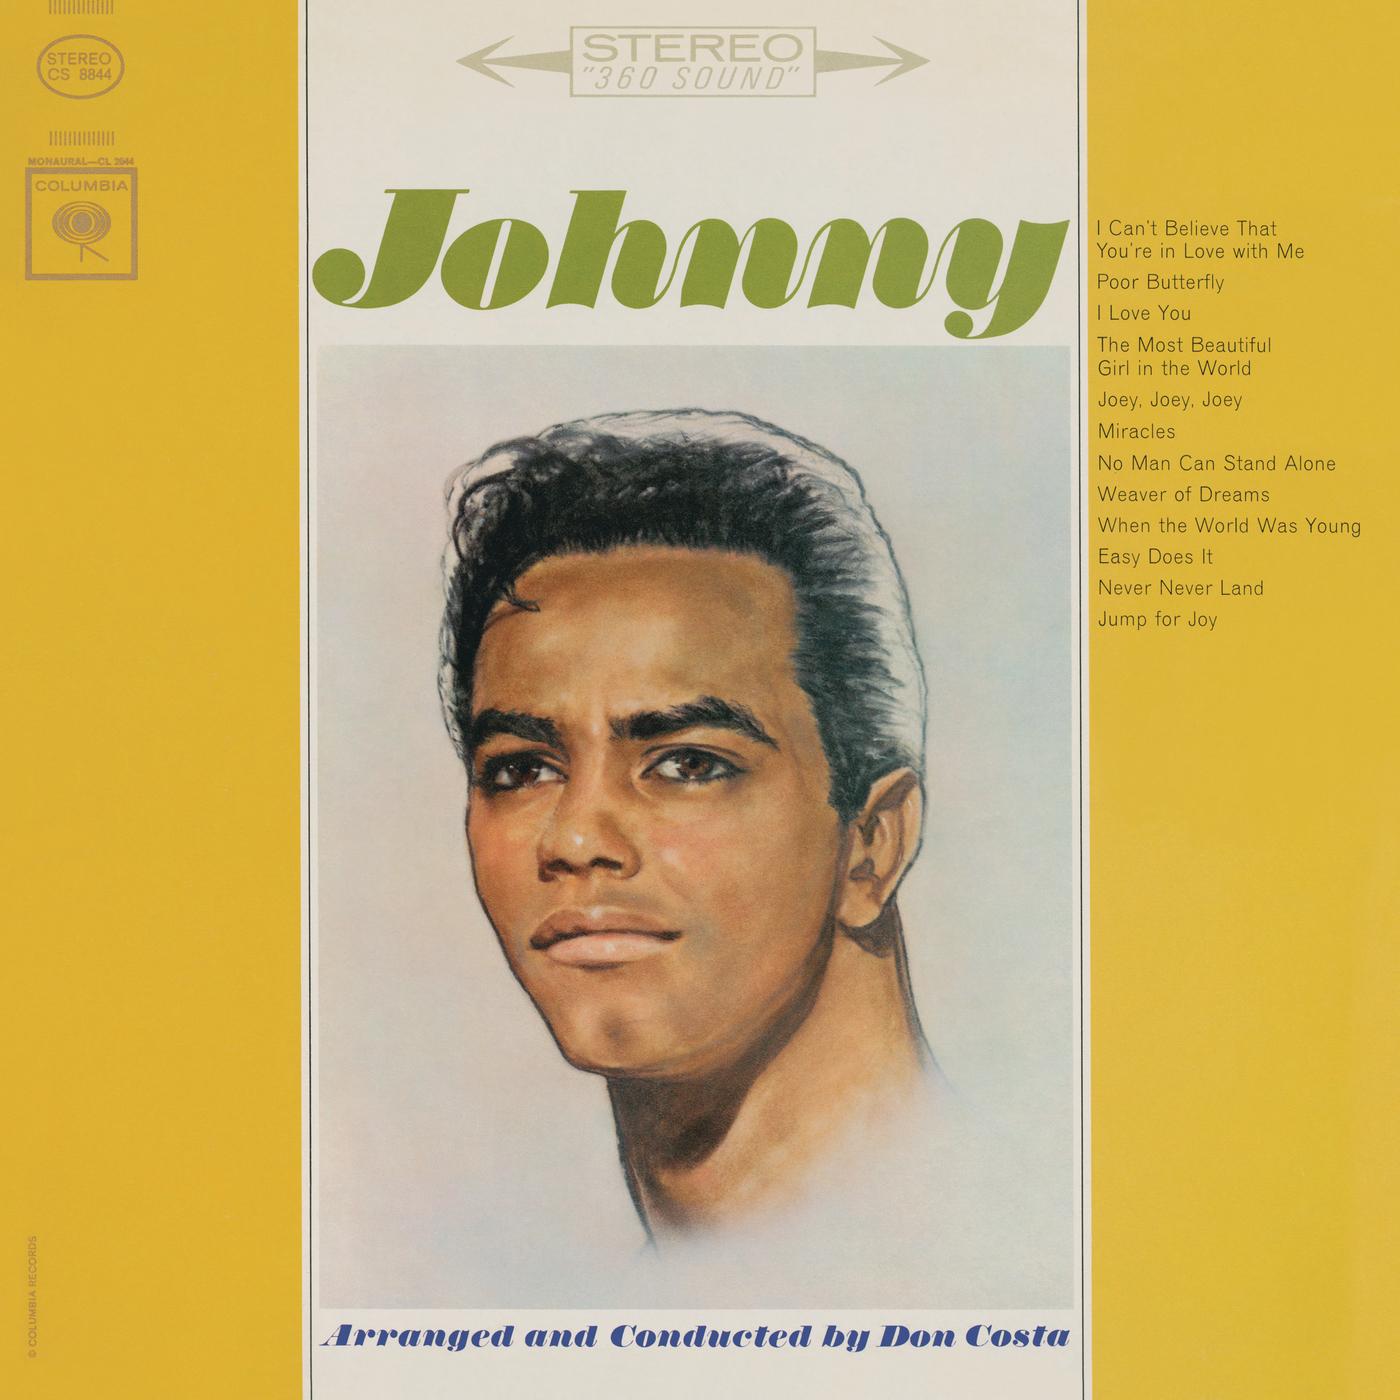 Johnny - Johnny Mathis